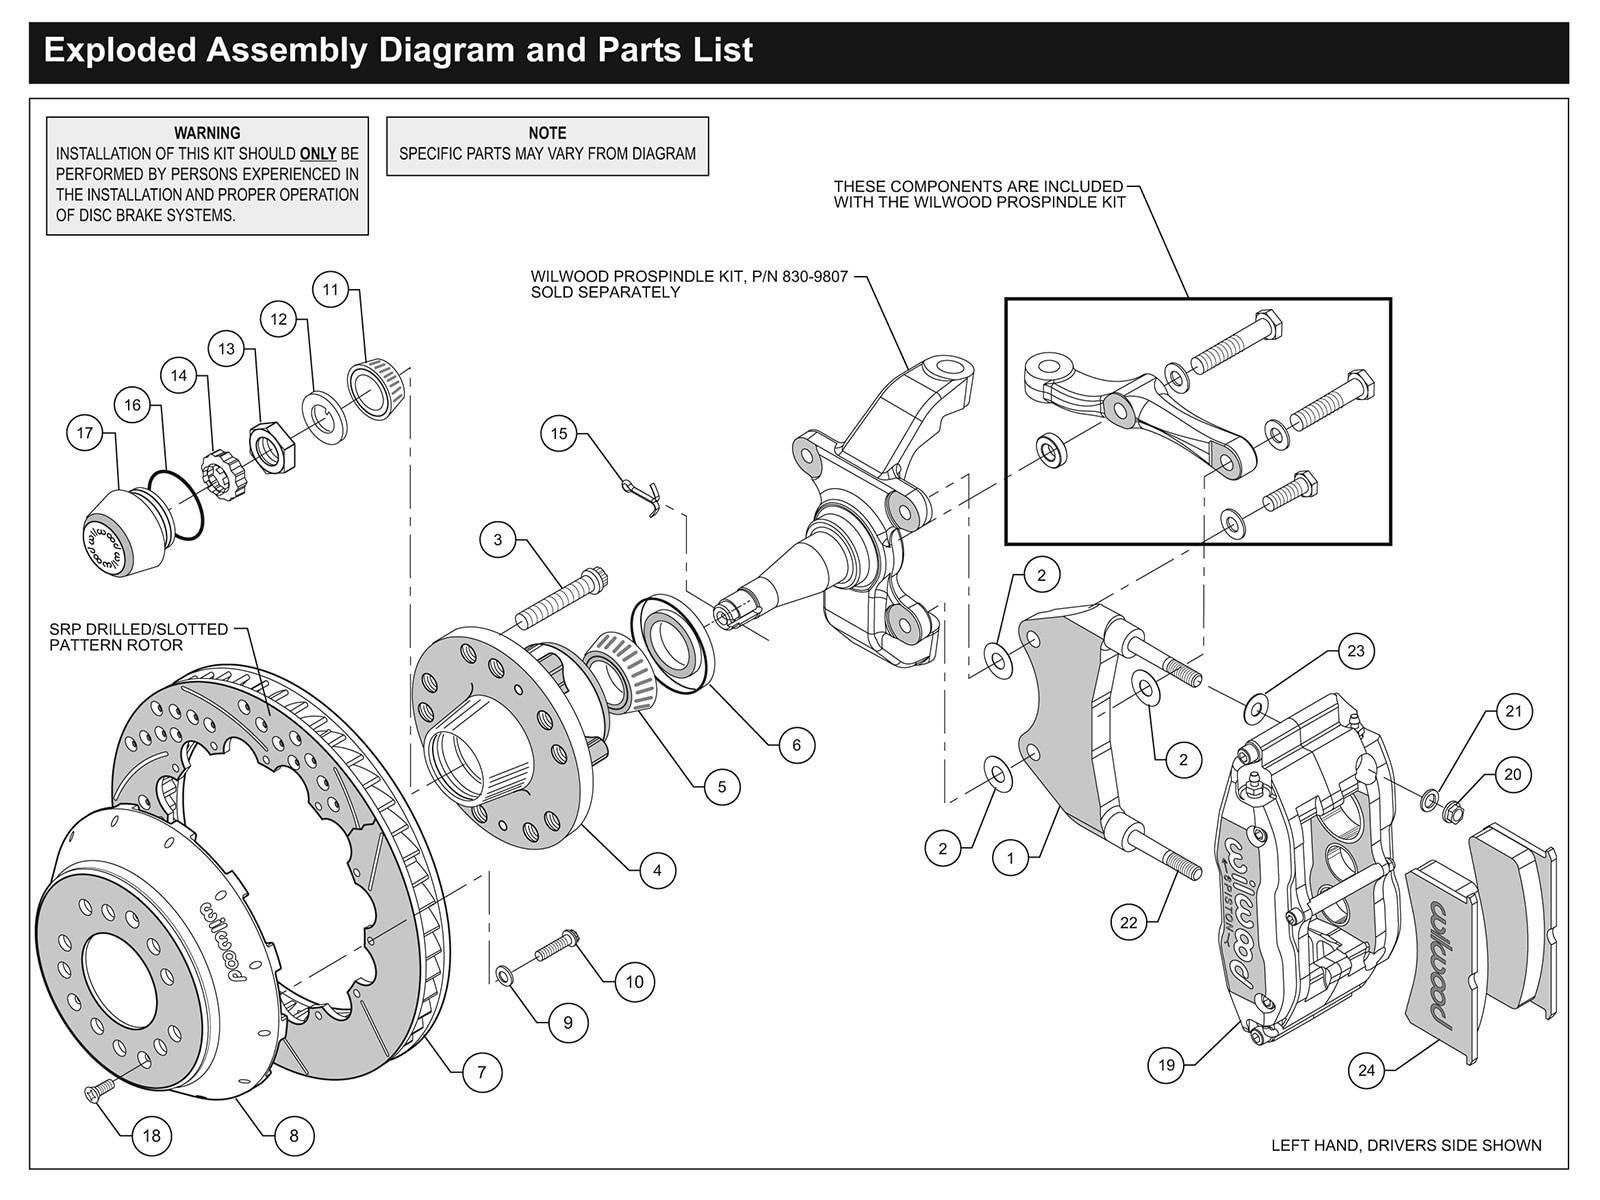 Brake Caliper Parts Diagram How to Install Wilwood Disc Brakes Hot Rod Network Of Brake Caliper Parts Diagram